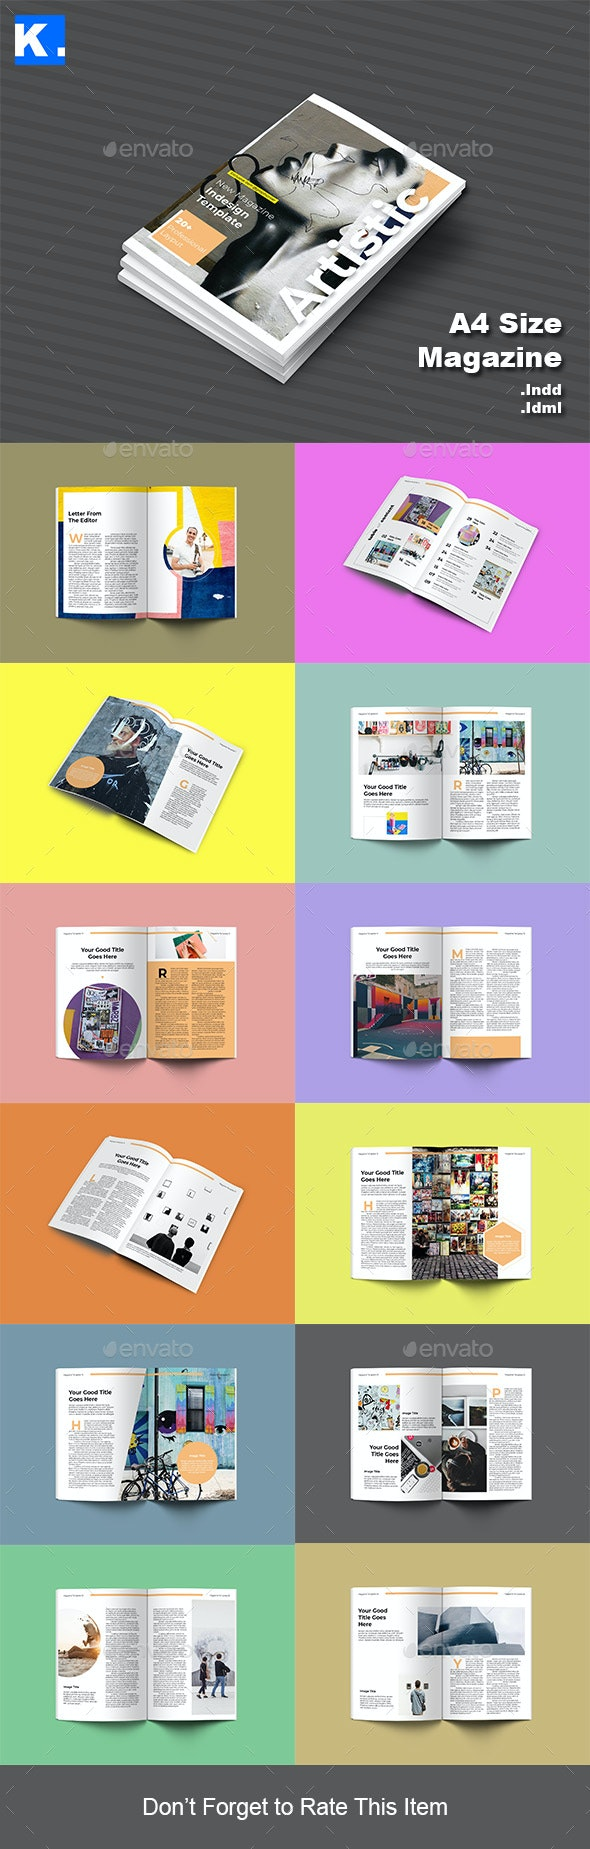 Indesign Magazine Template 13 - Magazines Print Templates